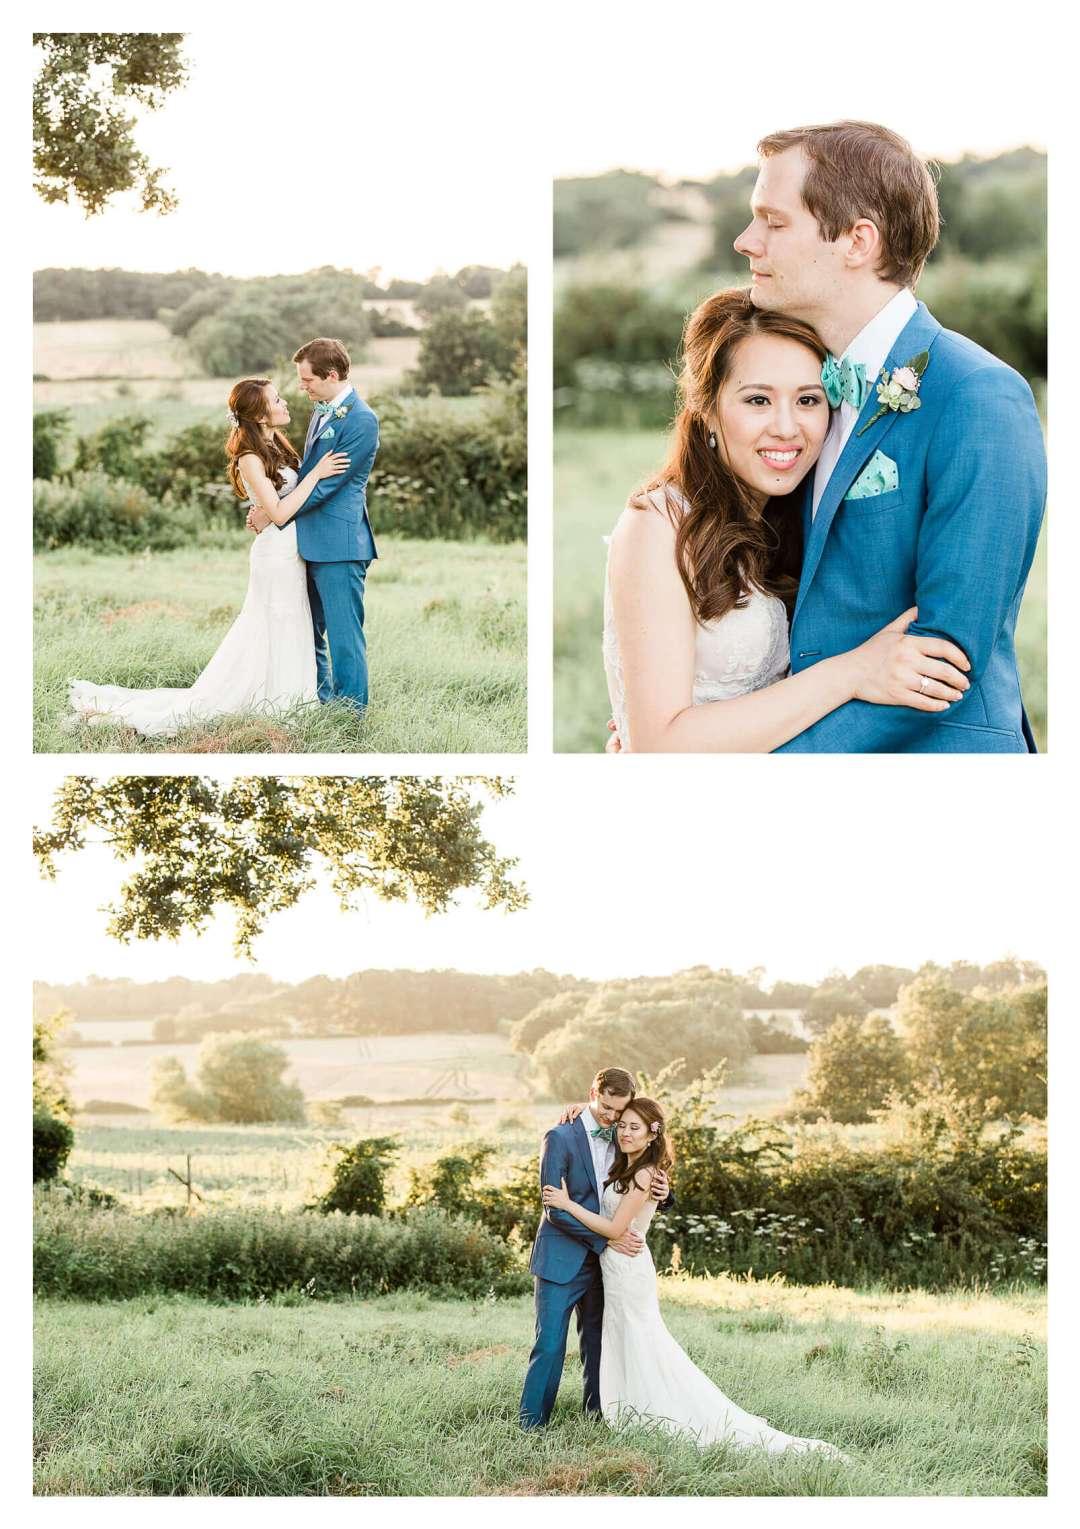 Finchcocks Oast wedding couple portraits in field at sunset | Kent wedding photographer